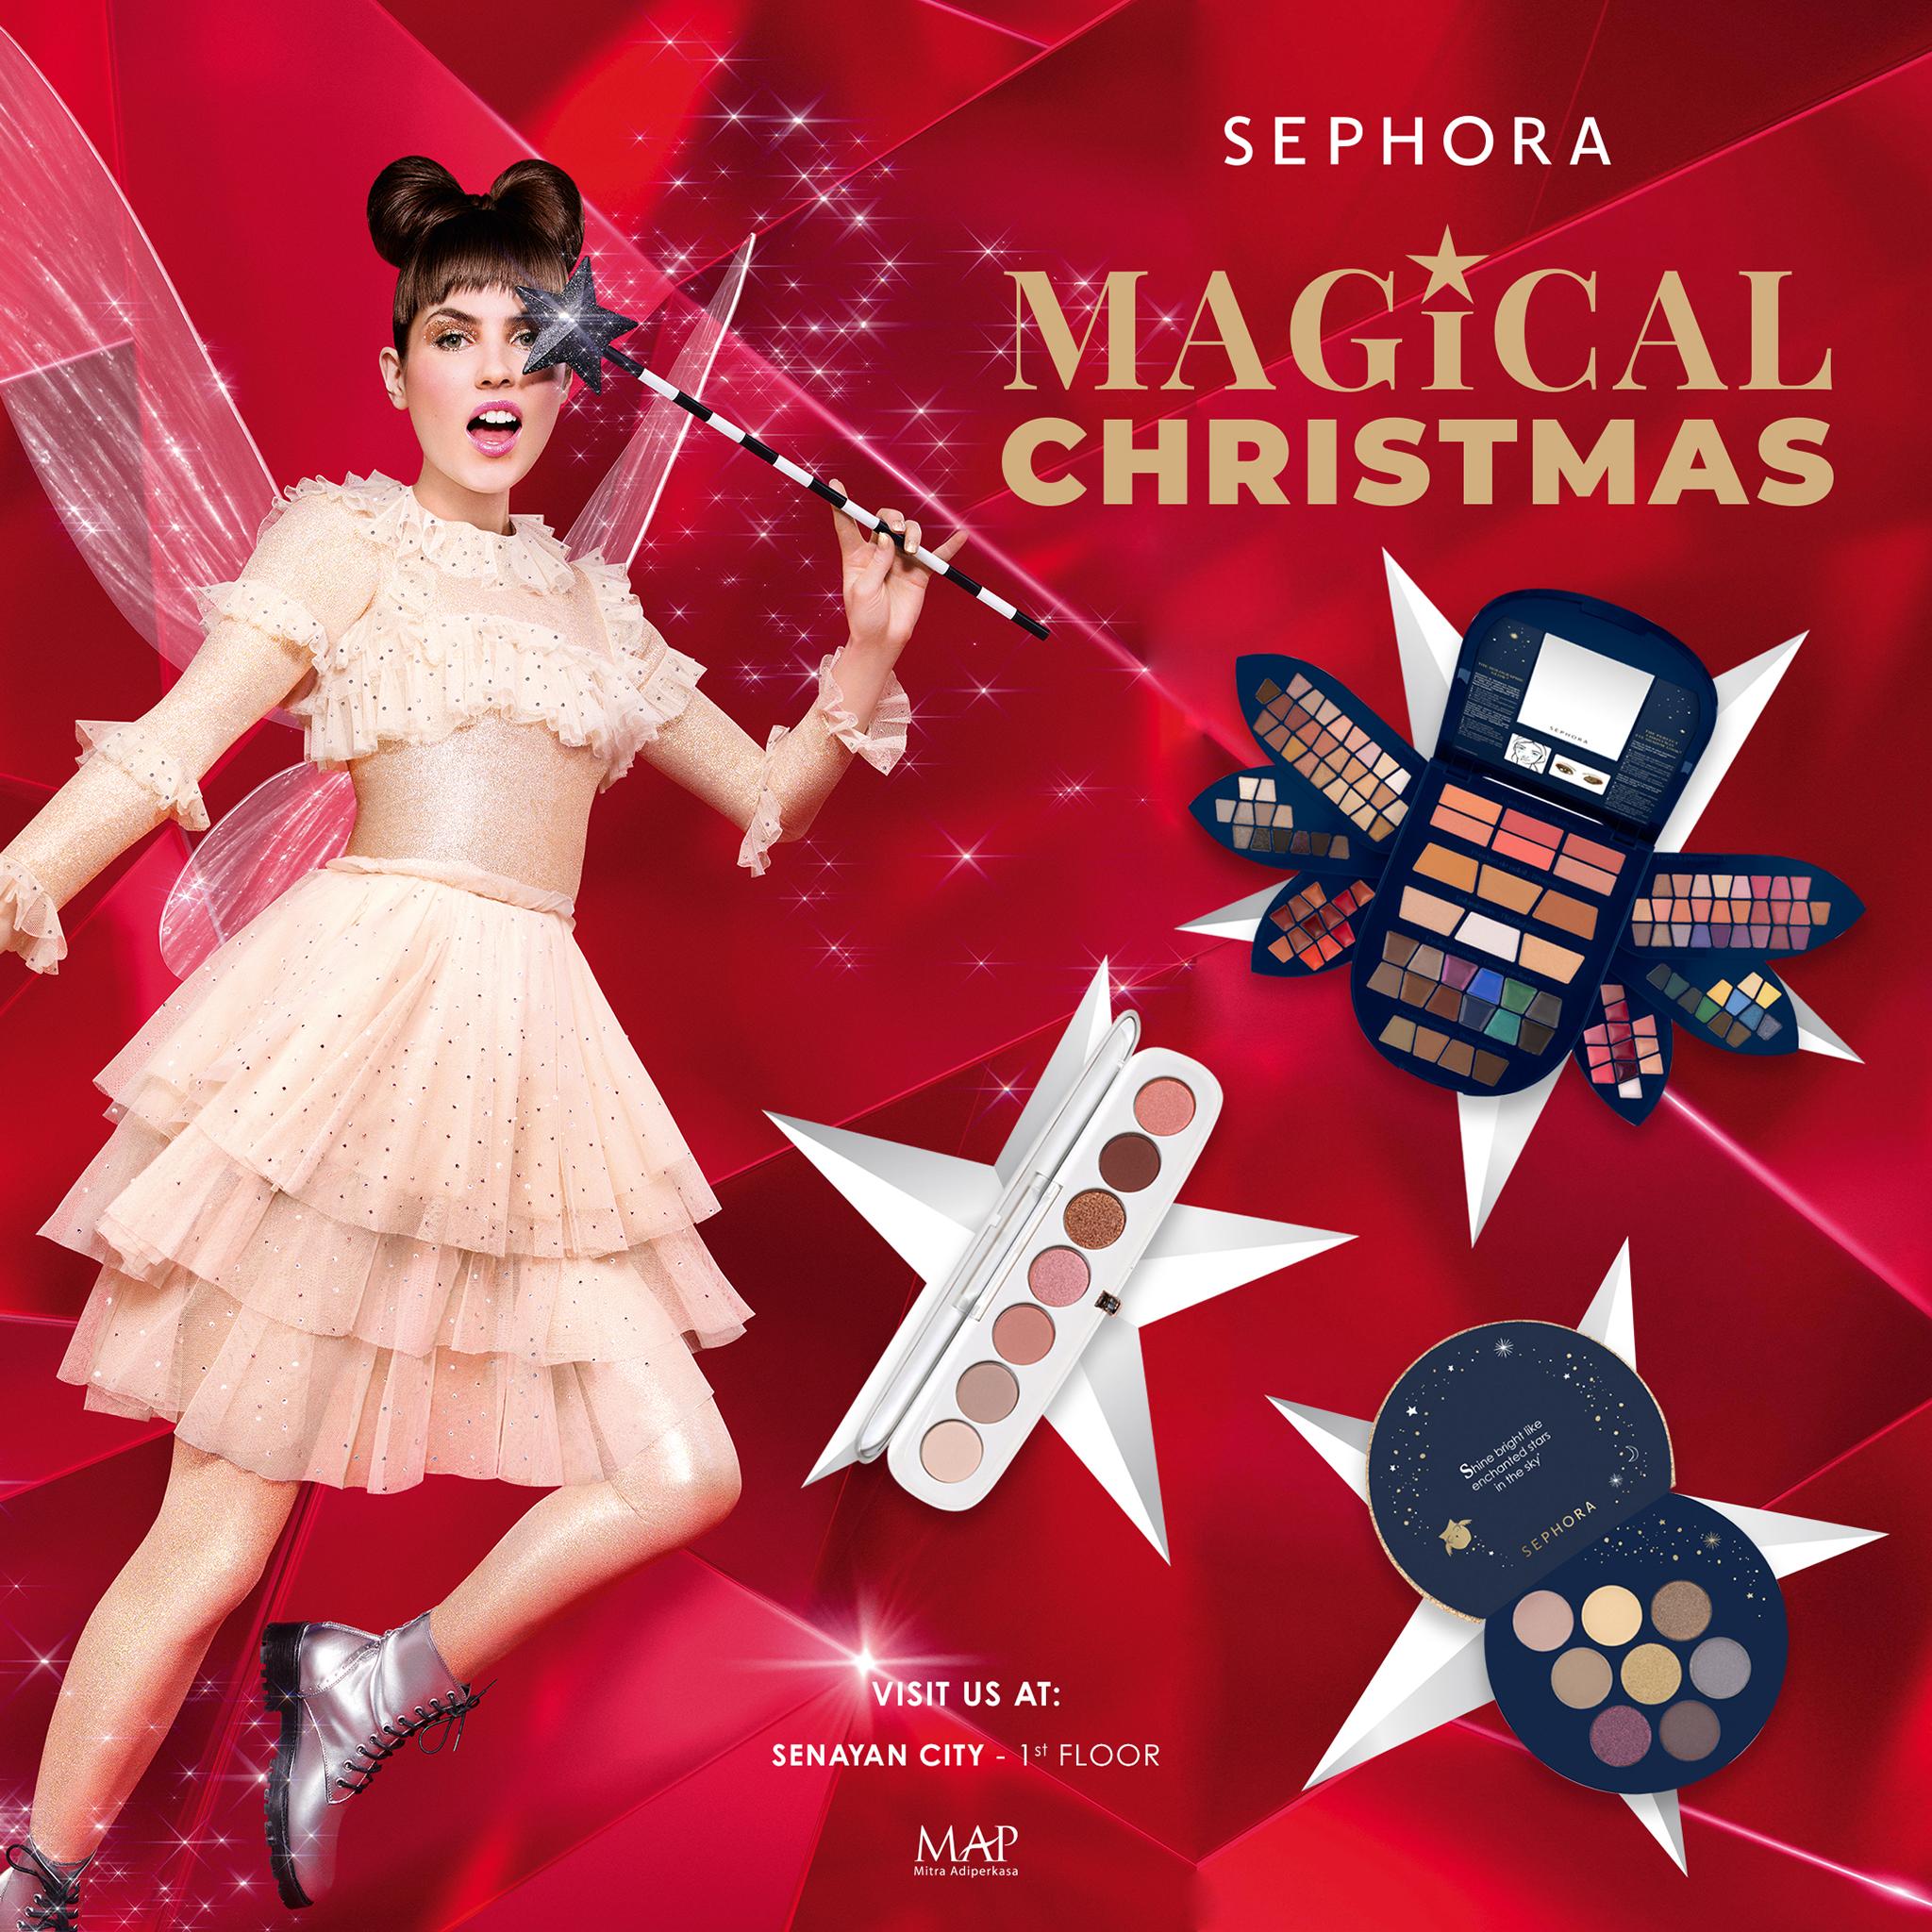 SEPHORA MAGICAL CHRISTMAS